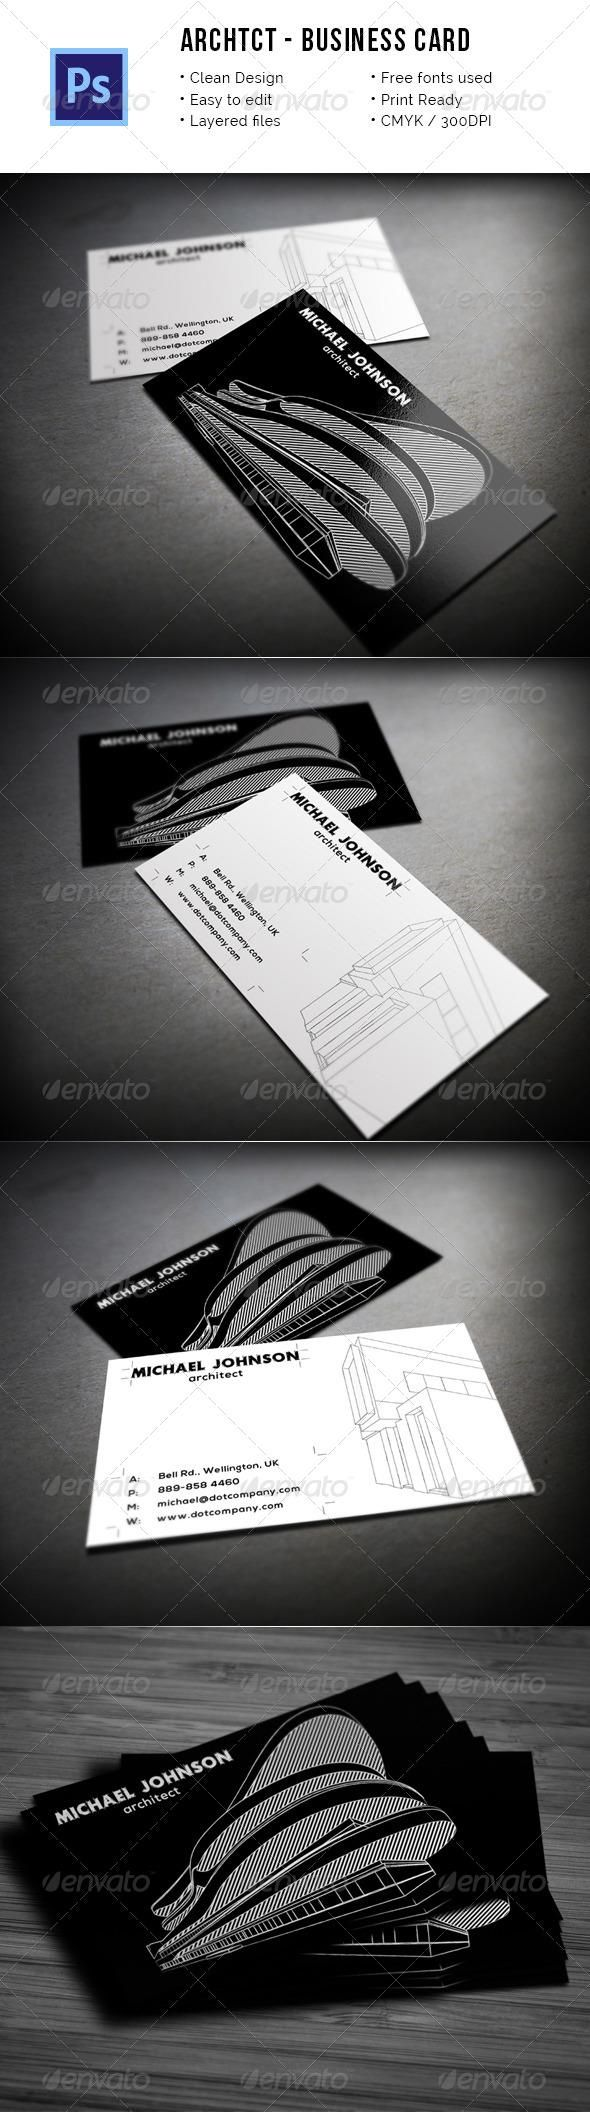 1661 best Business card design images on Pinterest | Business card ...